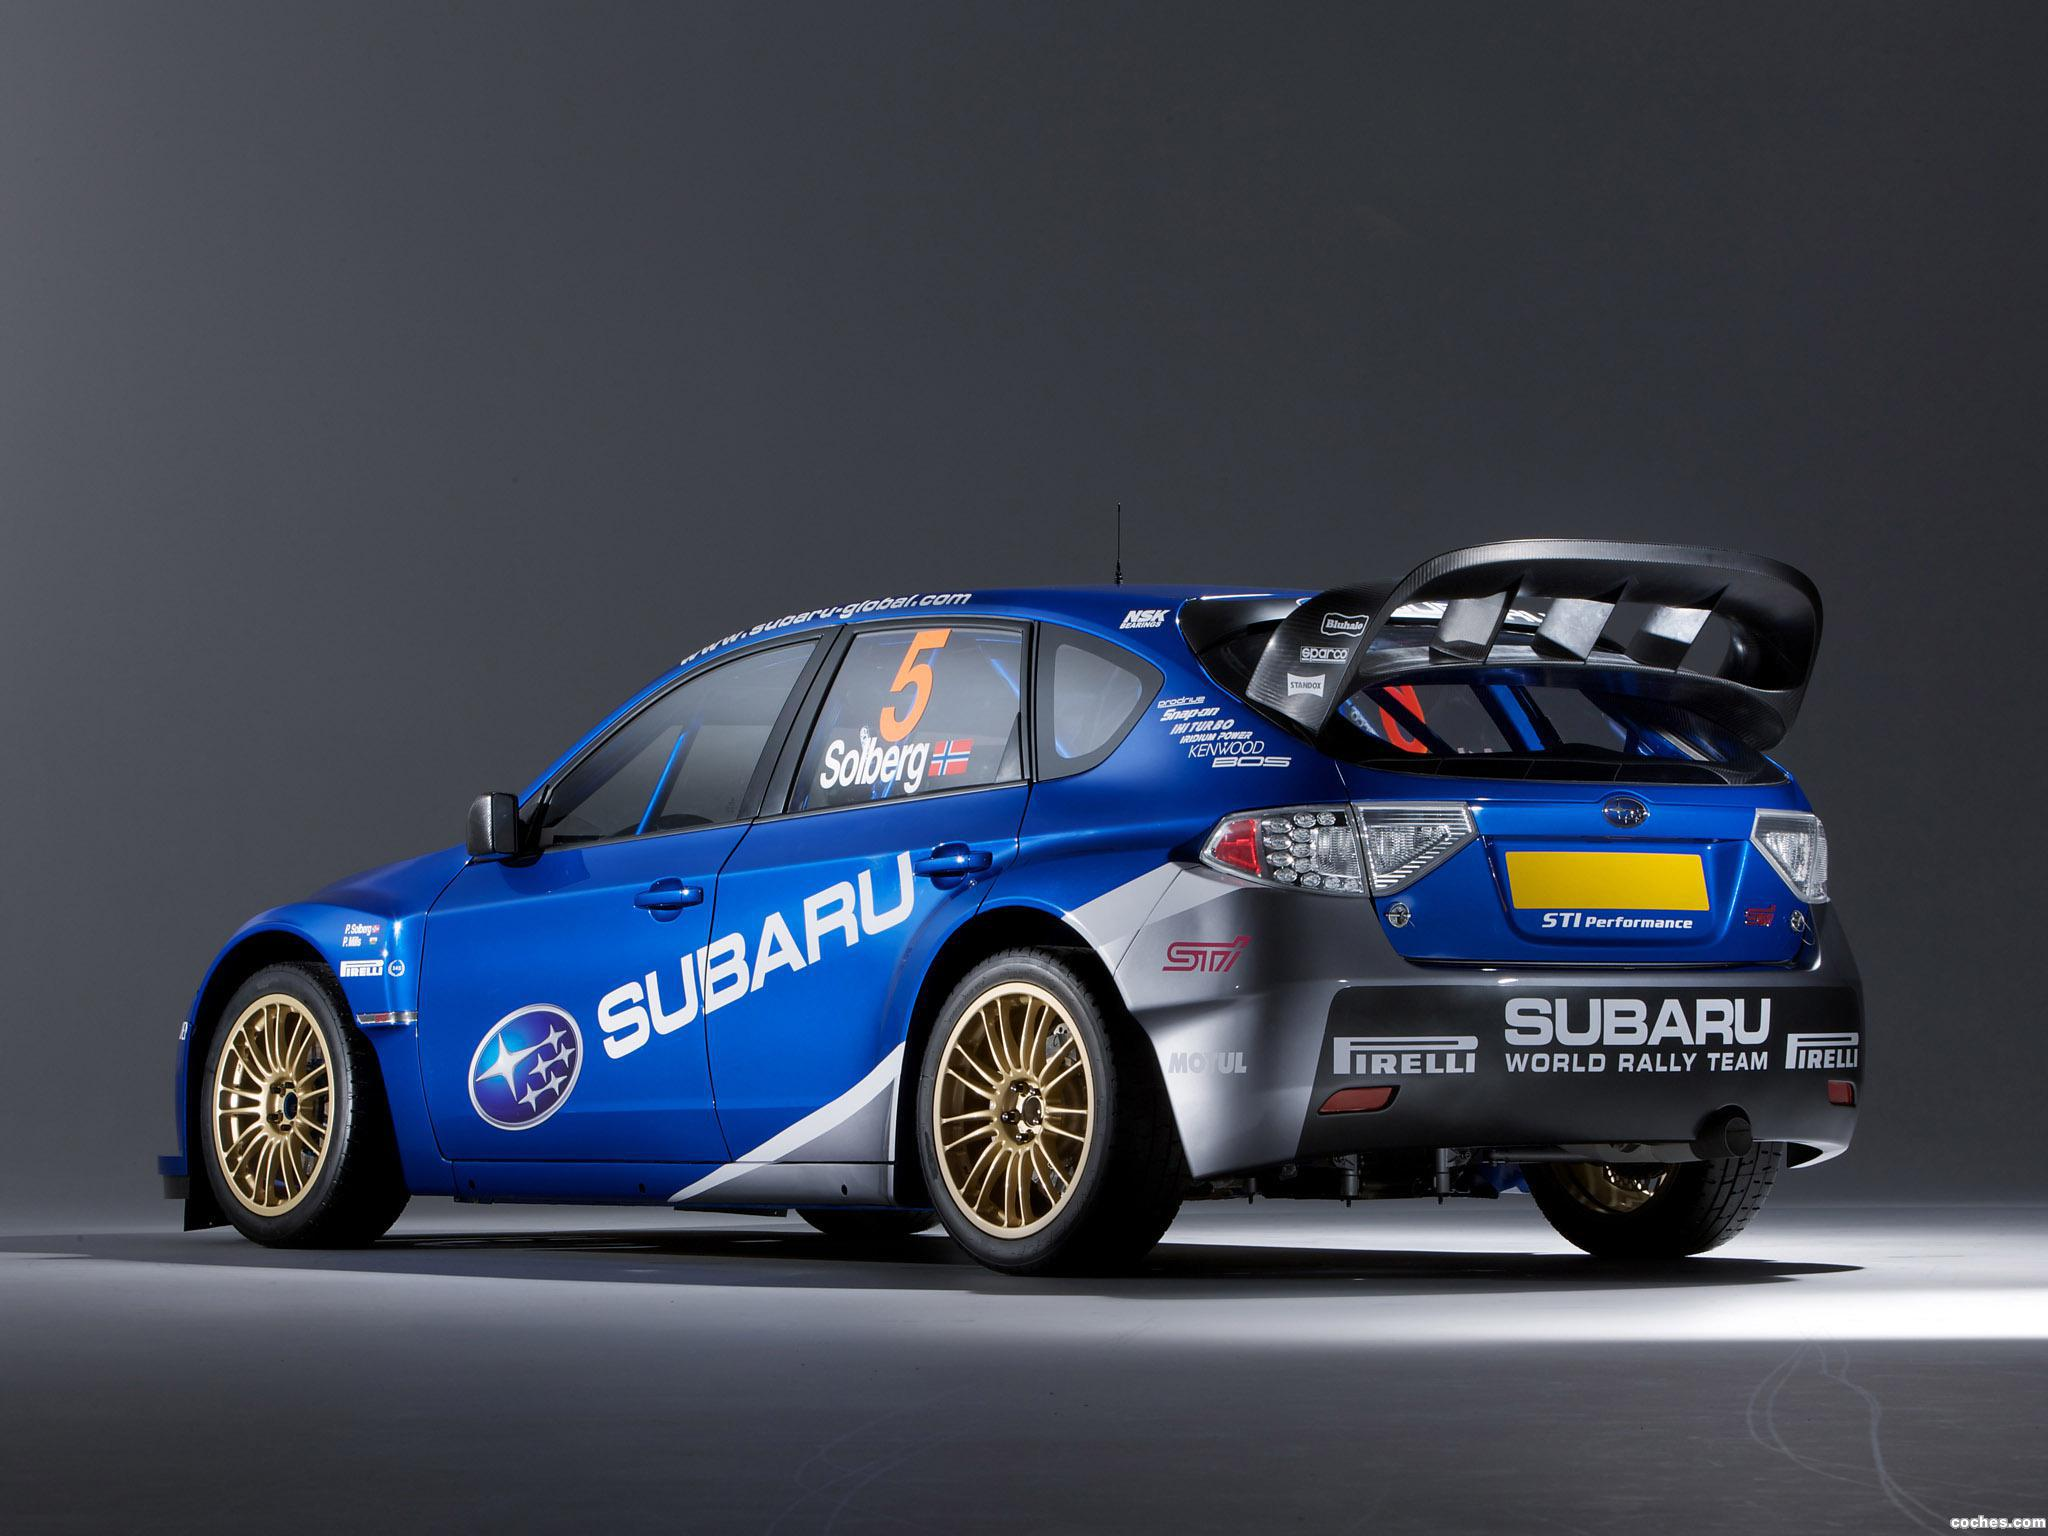 Foto 4 de Subaru Impreza WRC 2008